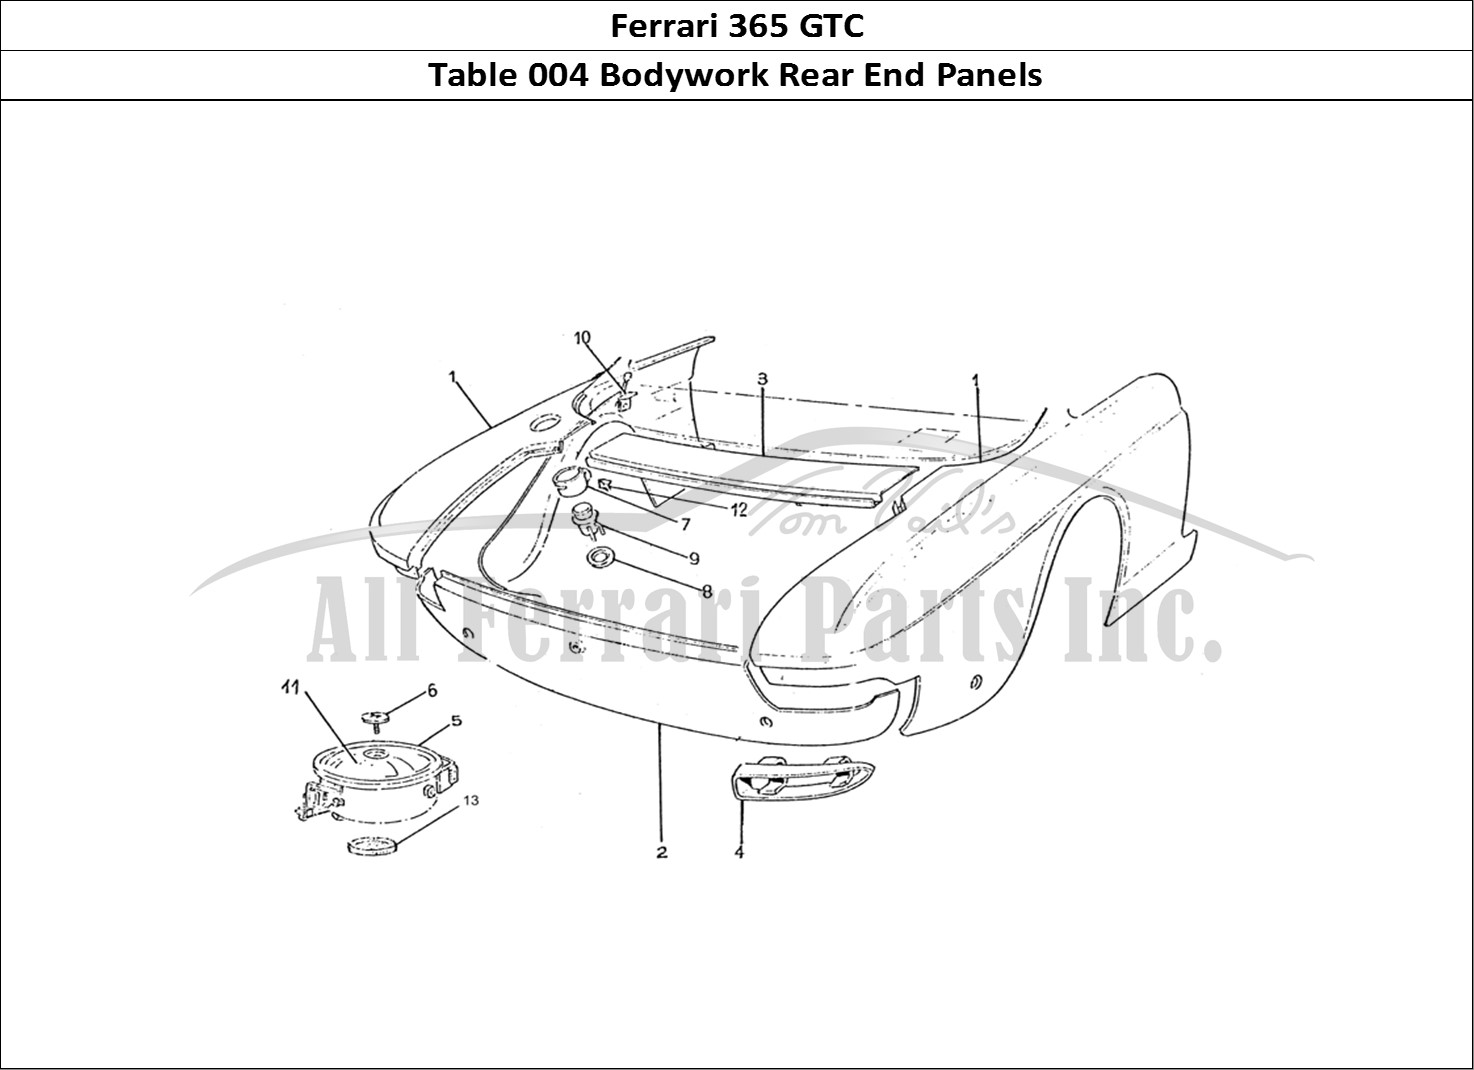 Buy Original Ferrari 365 Gtc 004 Bodywork Rear End Panels